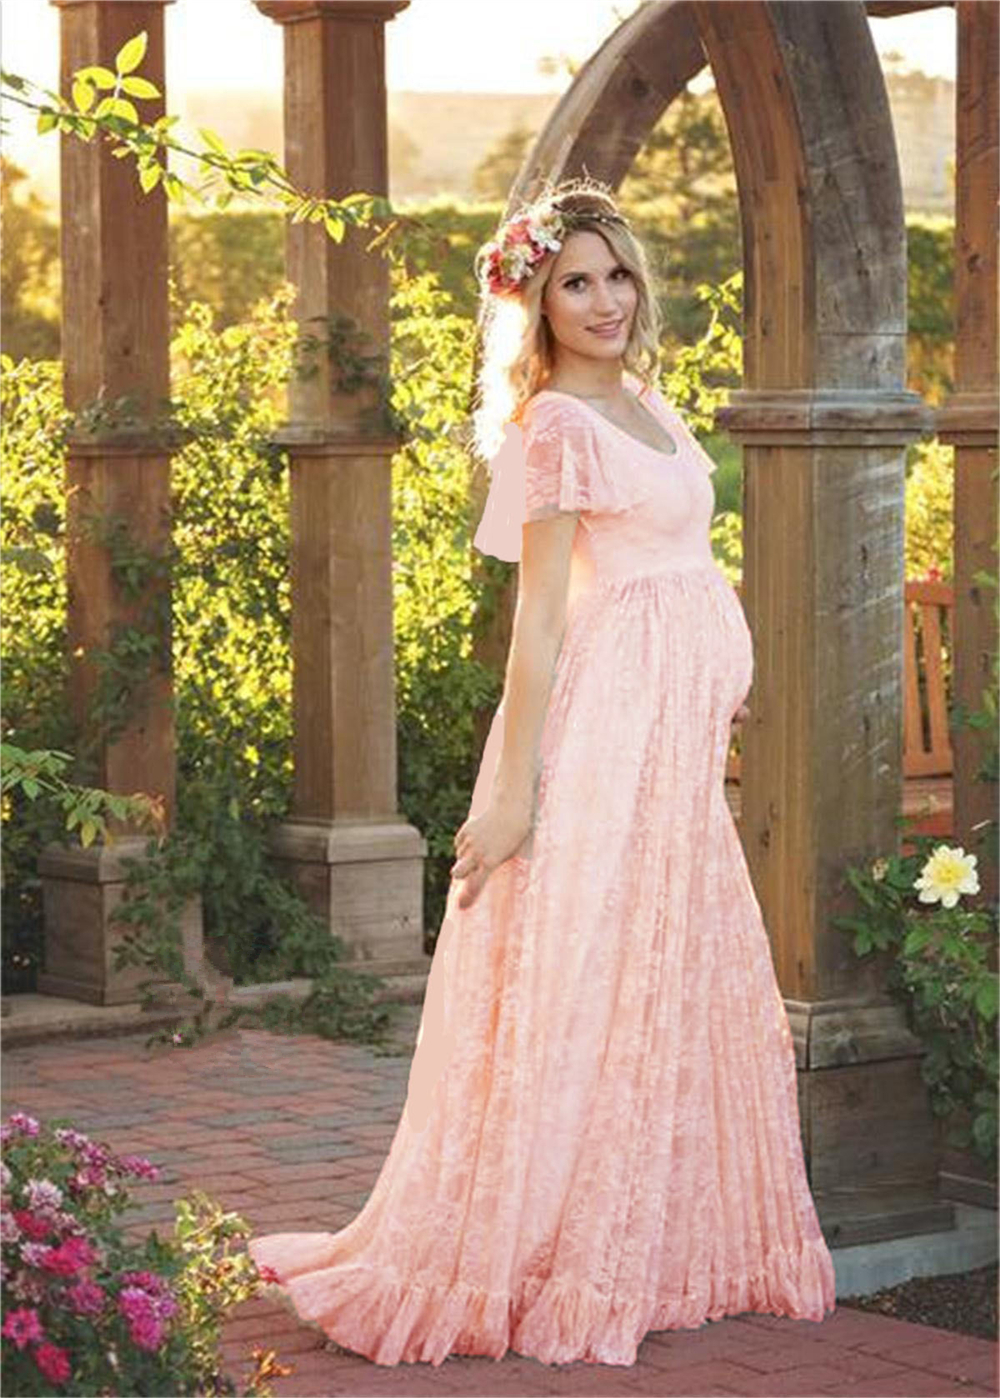 2018 Plus Size Maternity Dresses For Photo Shoot Fashion Lace Maxi ...